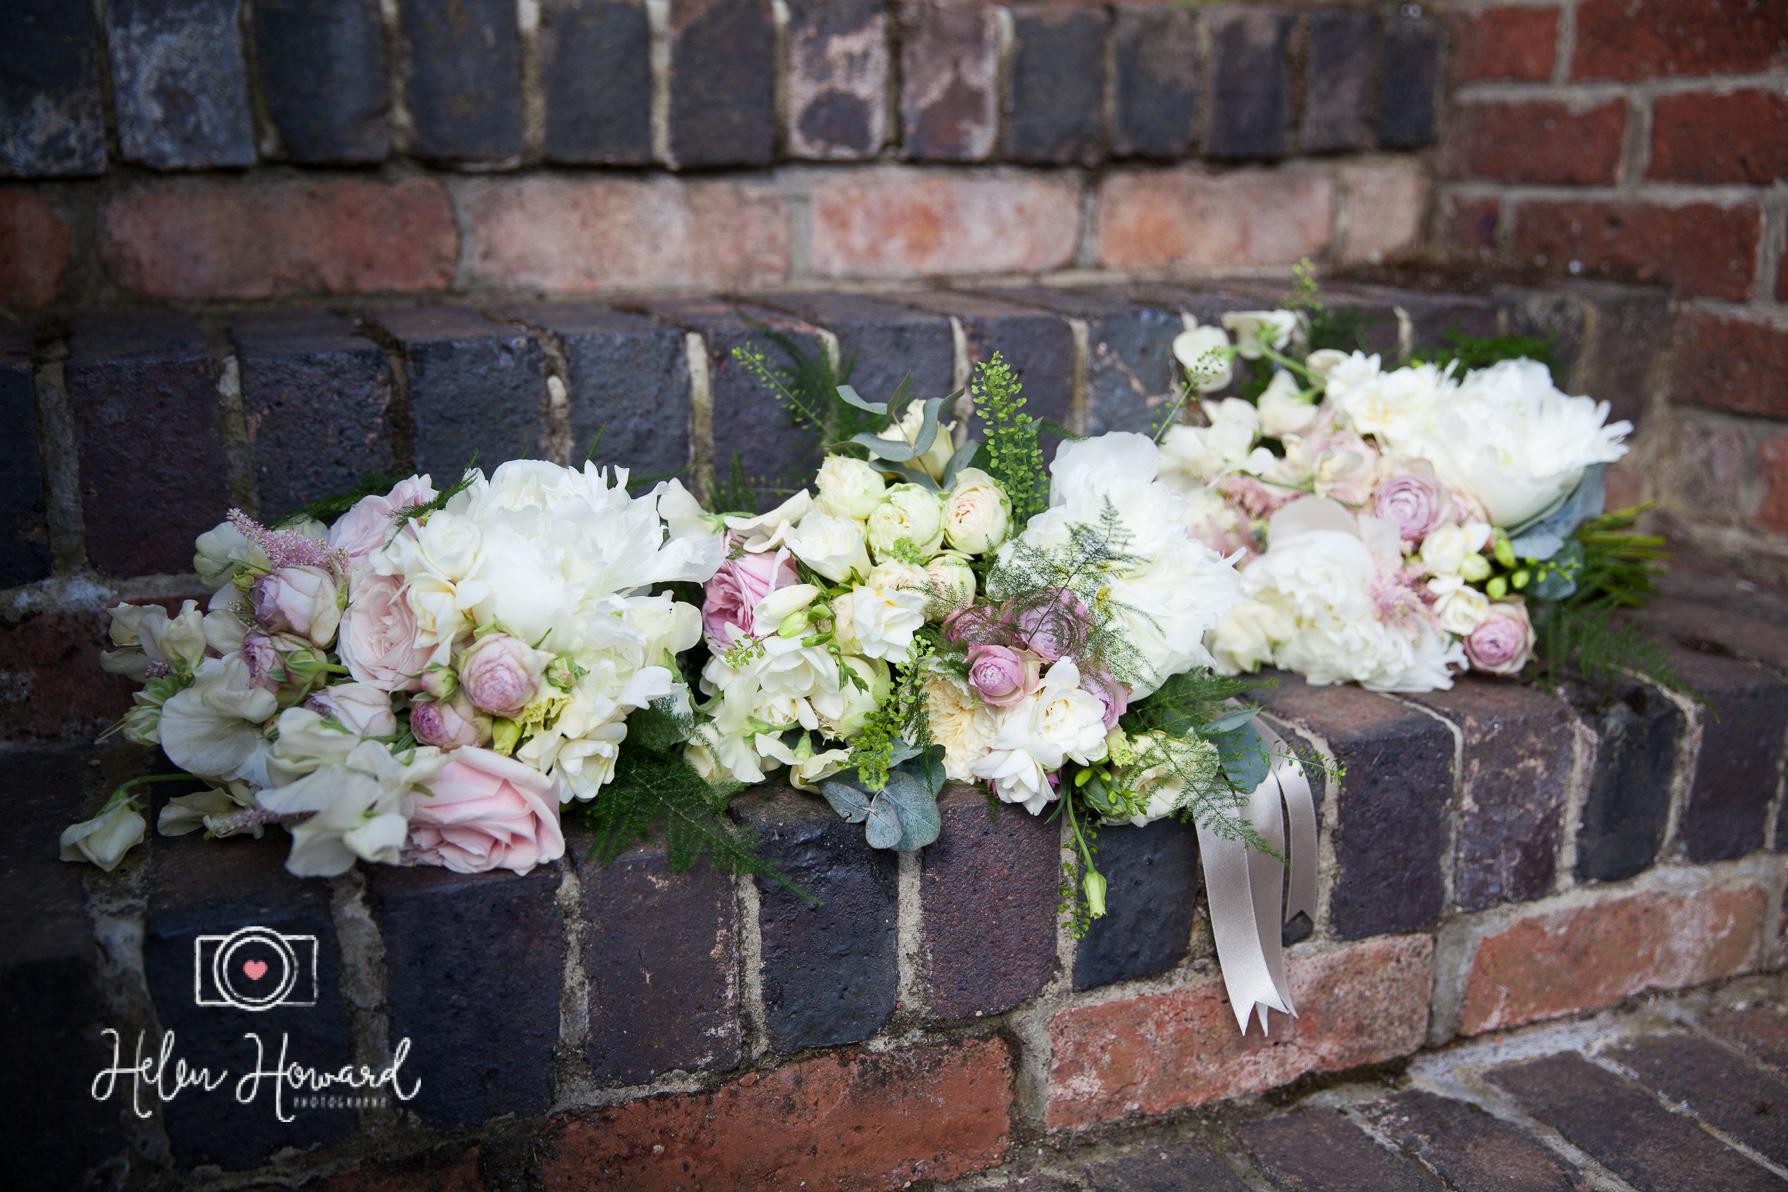 Helen Howard Photography Packington Moor Wedding-92.jpg